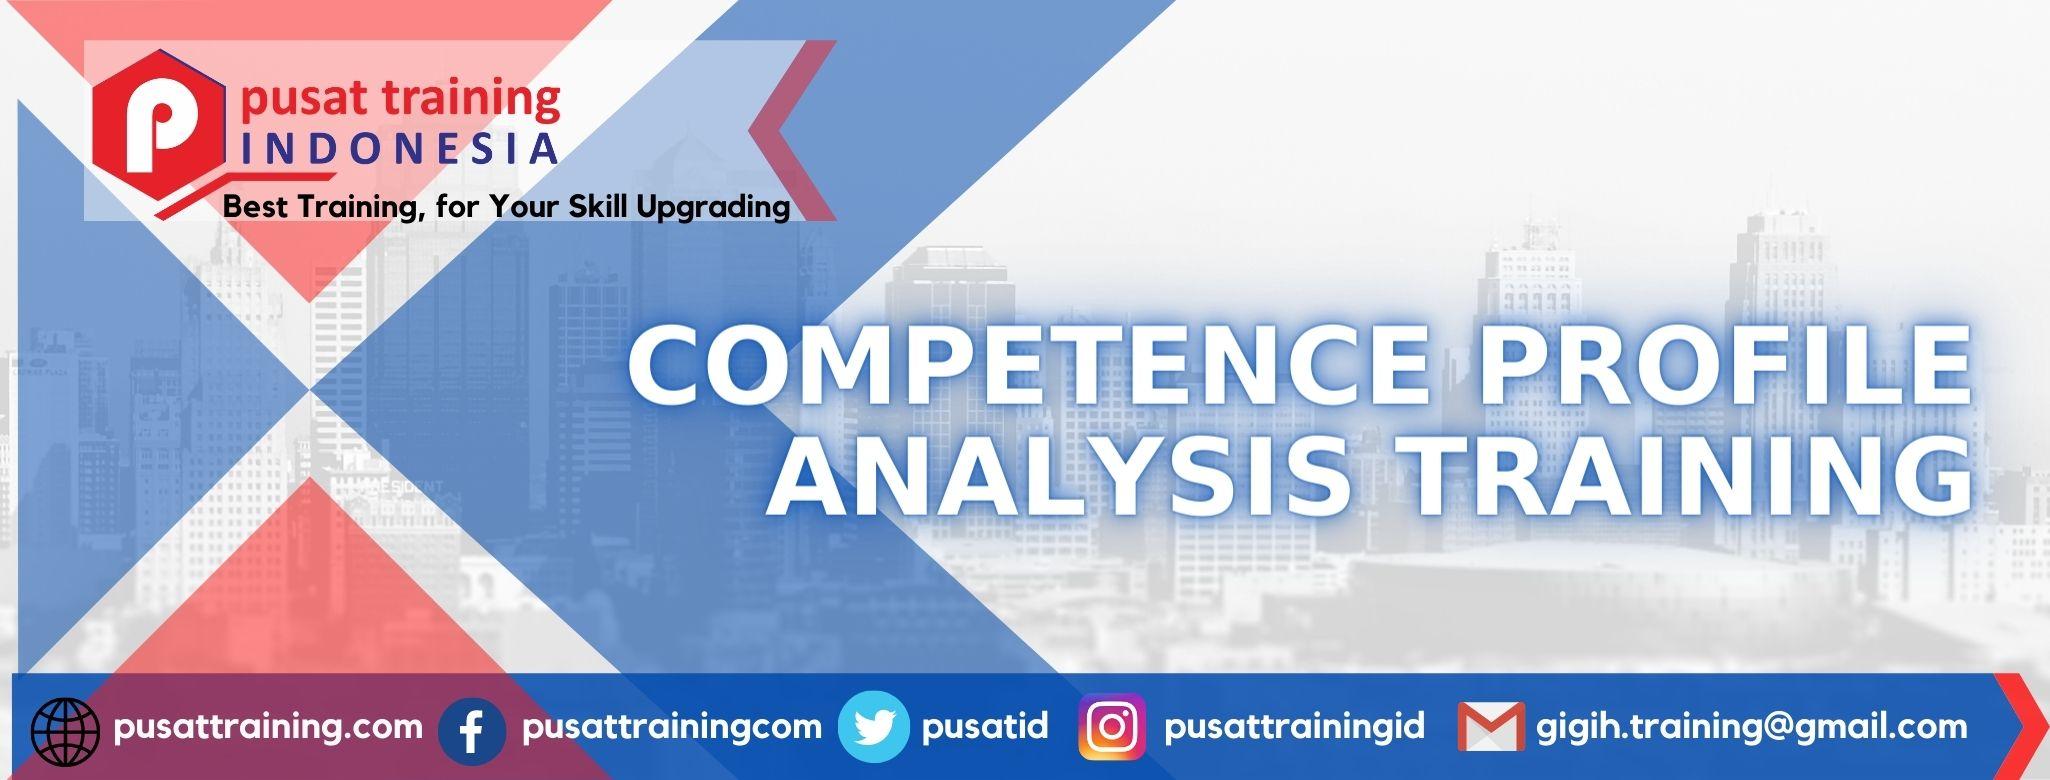 COMPETENCE PROFILE ANALYSIS TRAINING